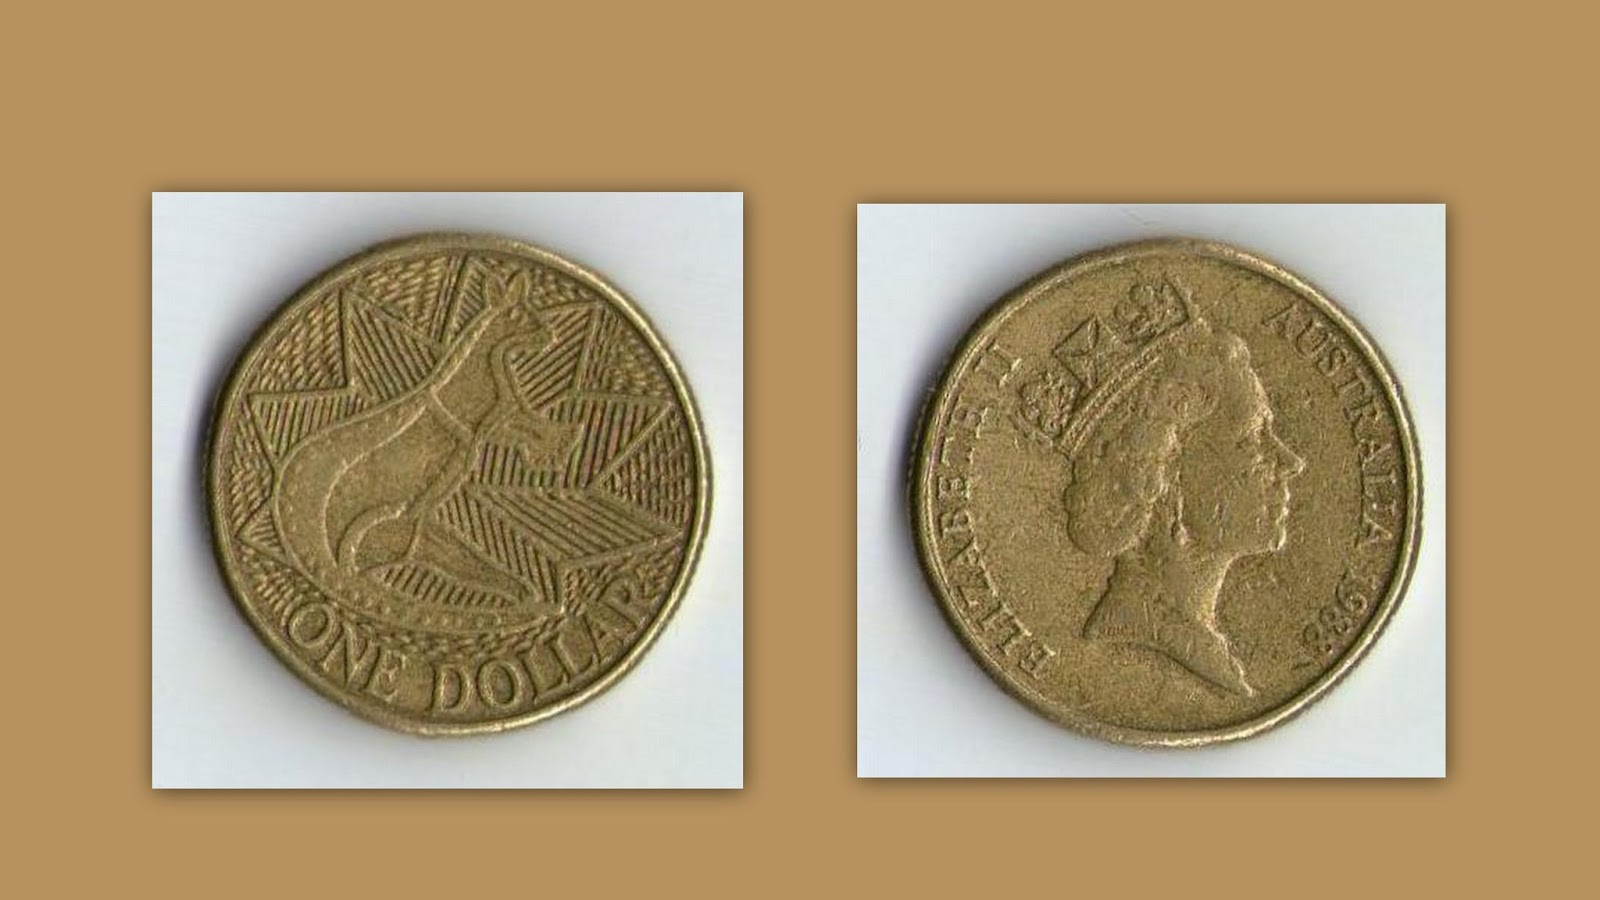 Australia 1988 Elizabeth Ii 1 Dollar Commemorative Coin 200 Years Of Australian Bicentary